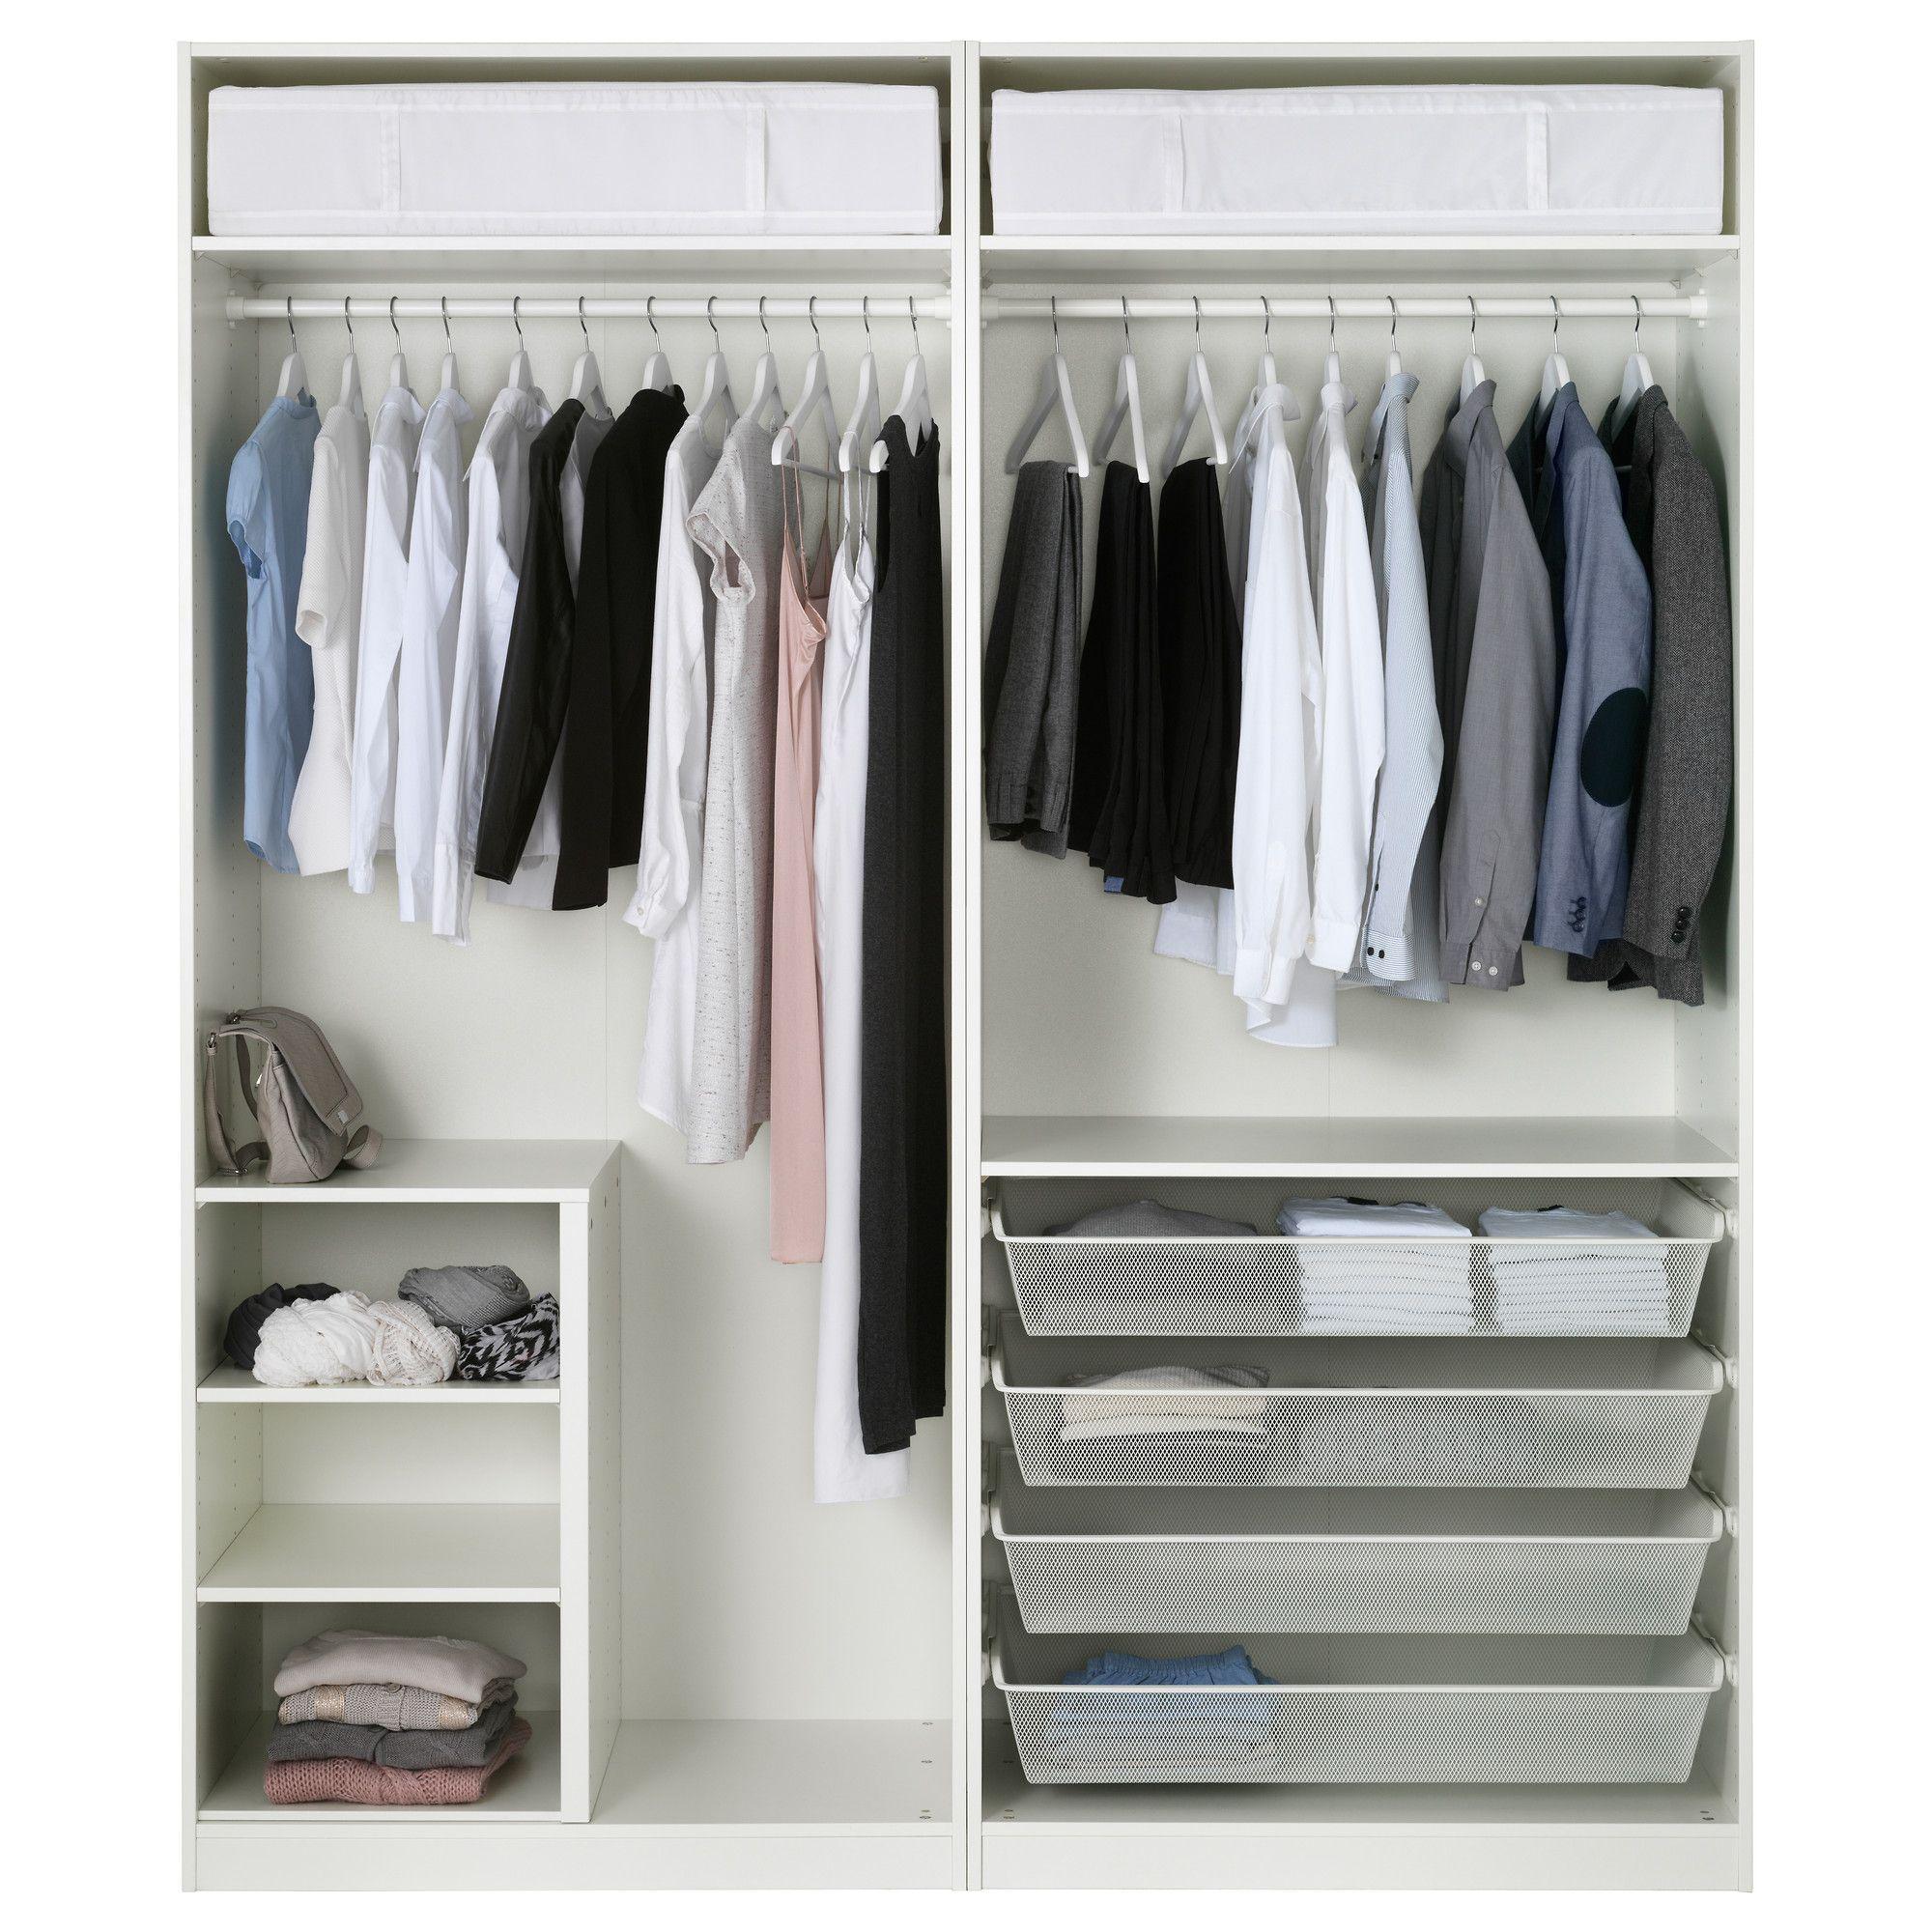 Tips for DIY Wardrobe Organizers Pax wardrobe, Ikea pax